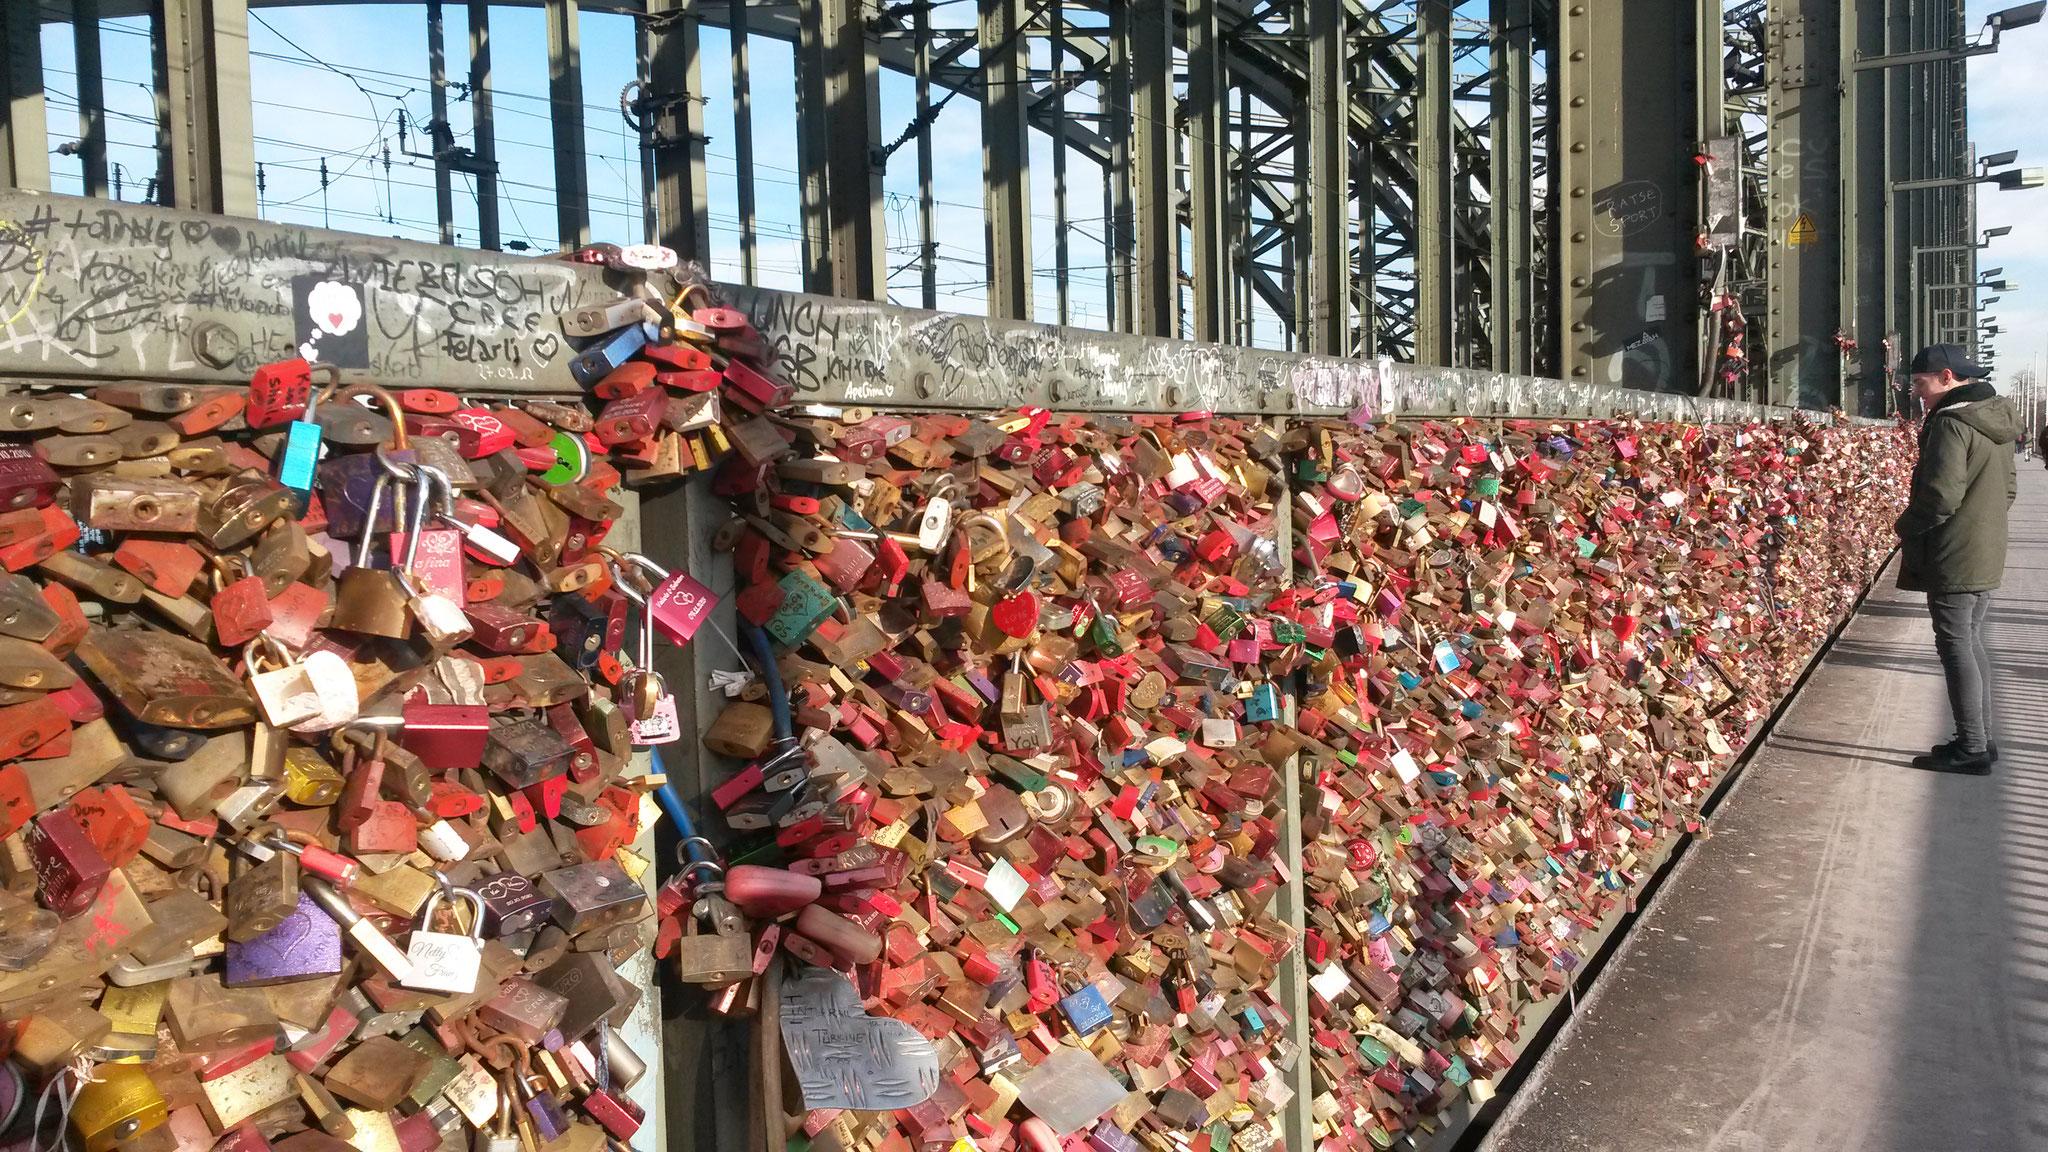 Liebesbeweise an der Hohenzollernbrücke